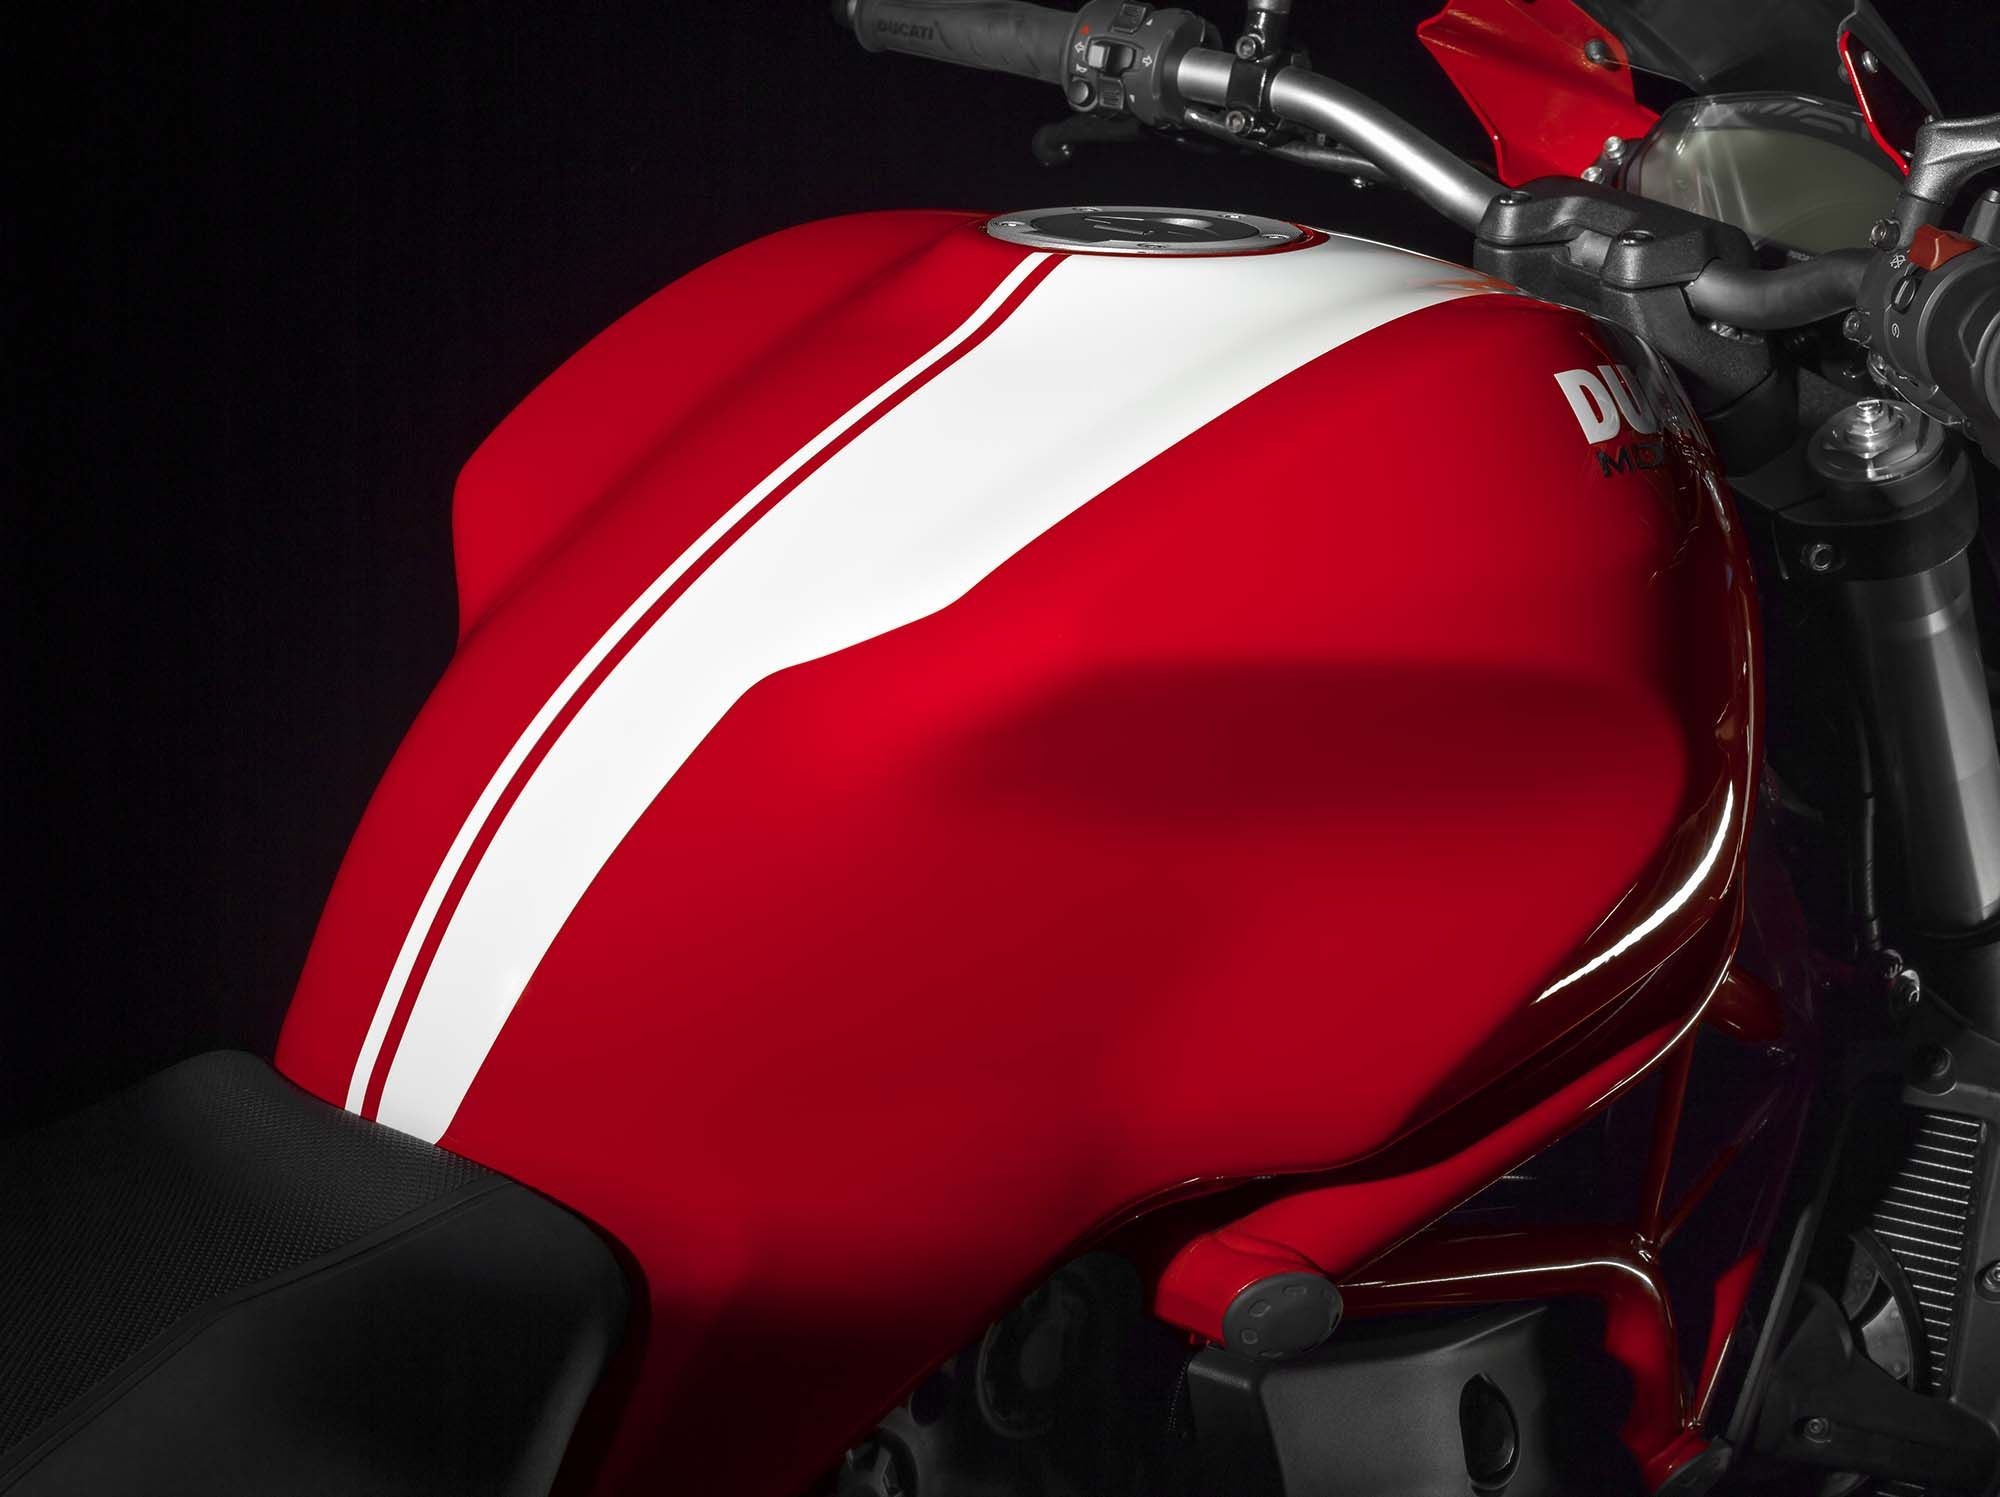 DucatiMonsterStripeEICMAjpg Ducati - Vinyl stripes for motorcyclespopular motorcycle tank stripesbuy cheap motorcycle tank stripes